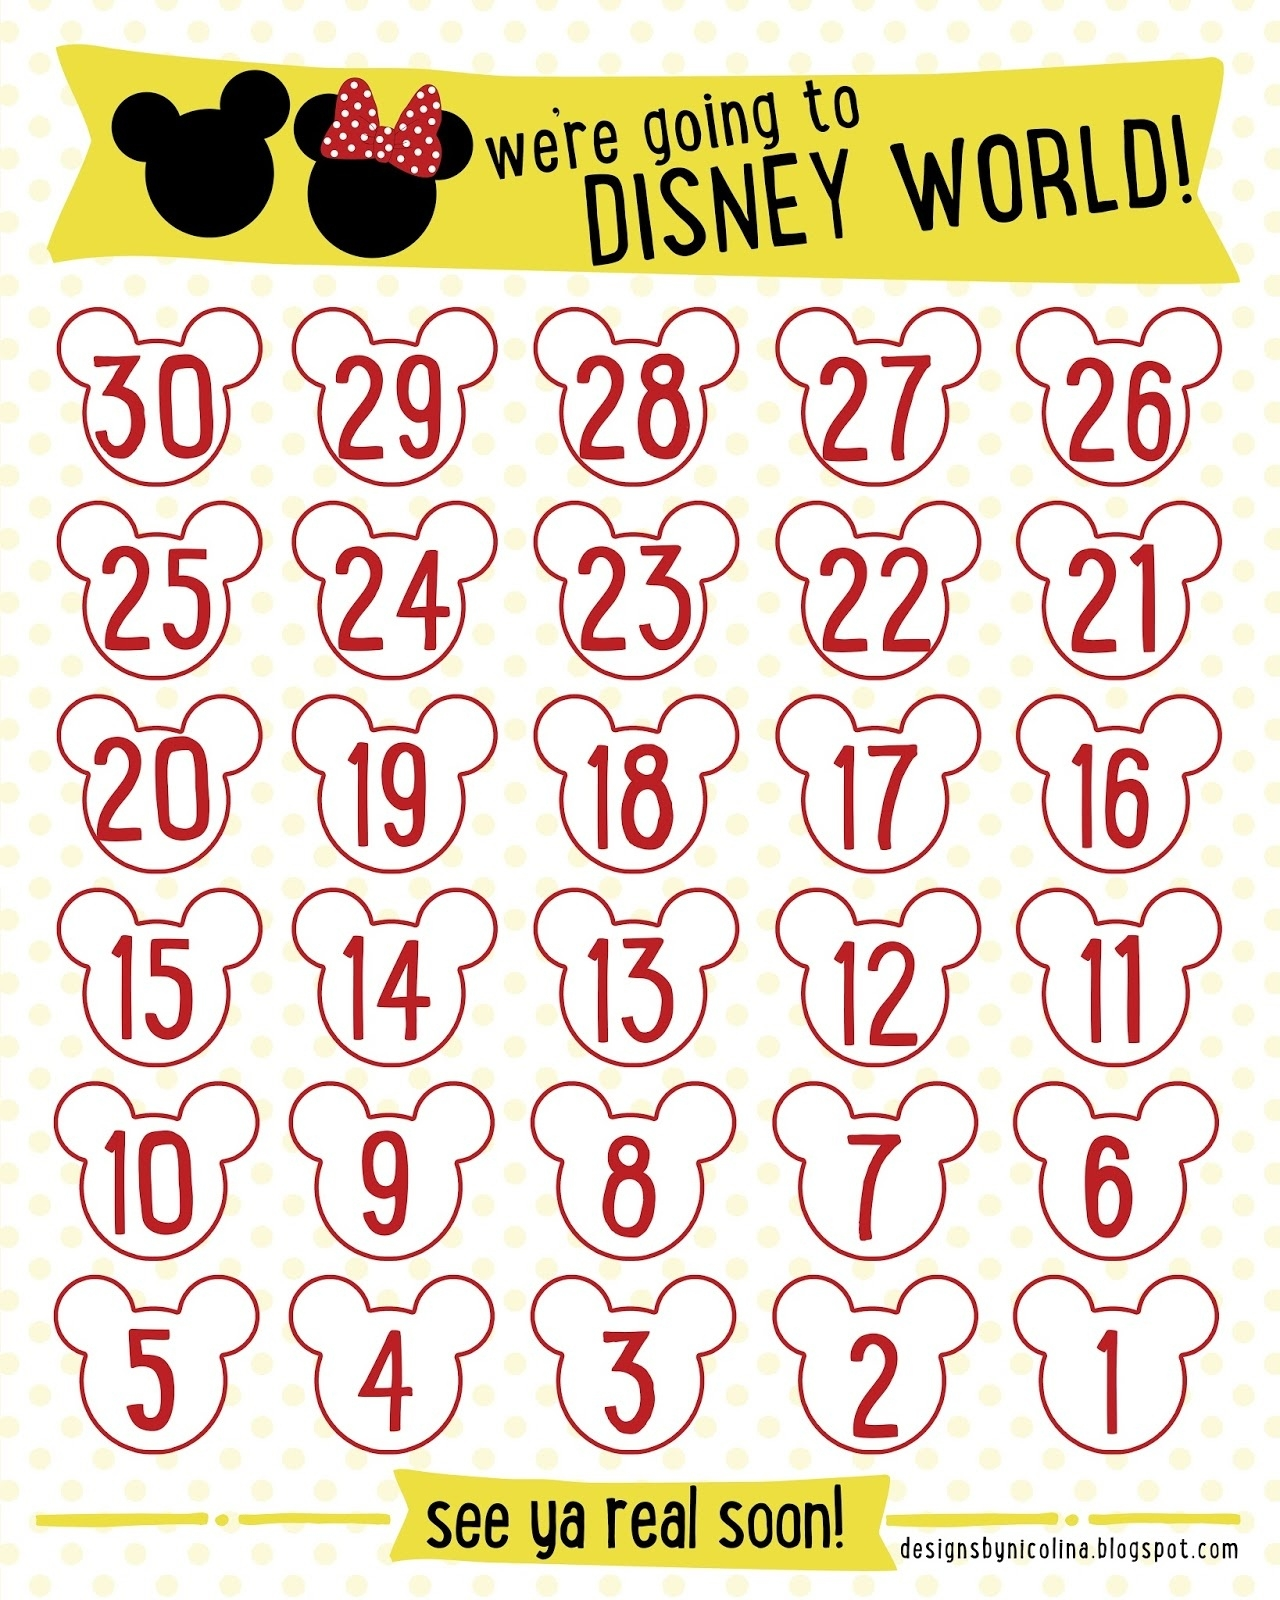 Designs By Nicolina: Disney Countdown! /// Free Printable ///_Countdown Calendar To Disney Vacation